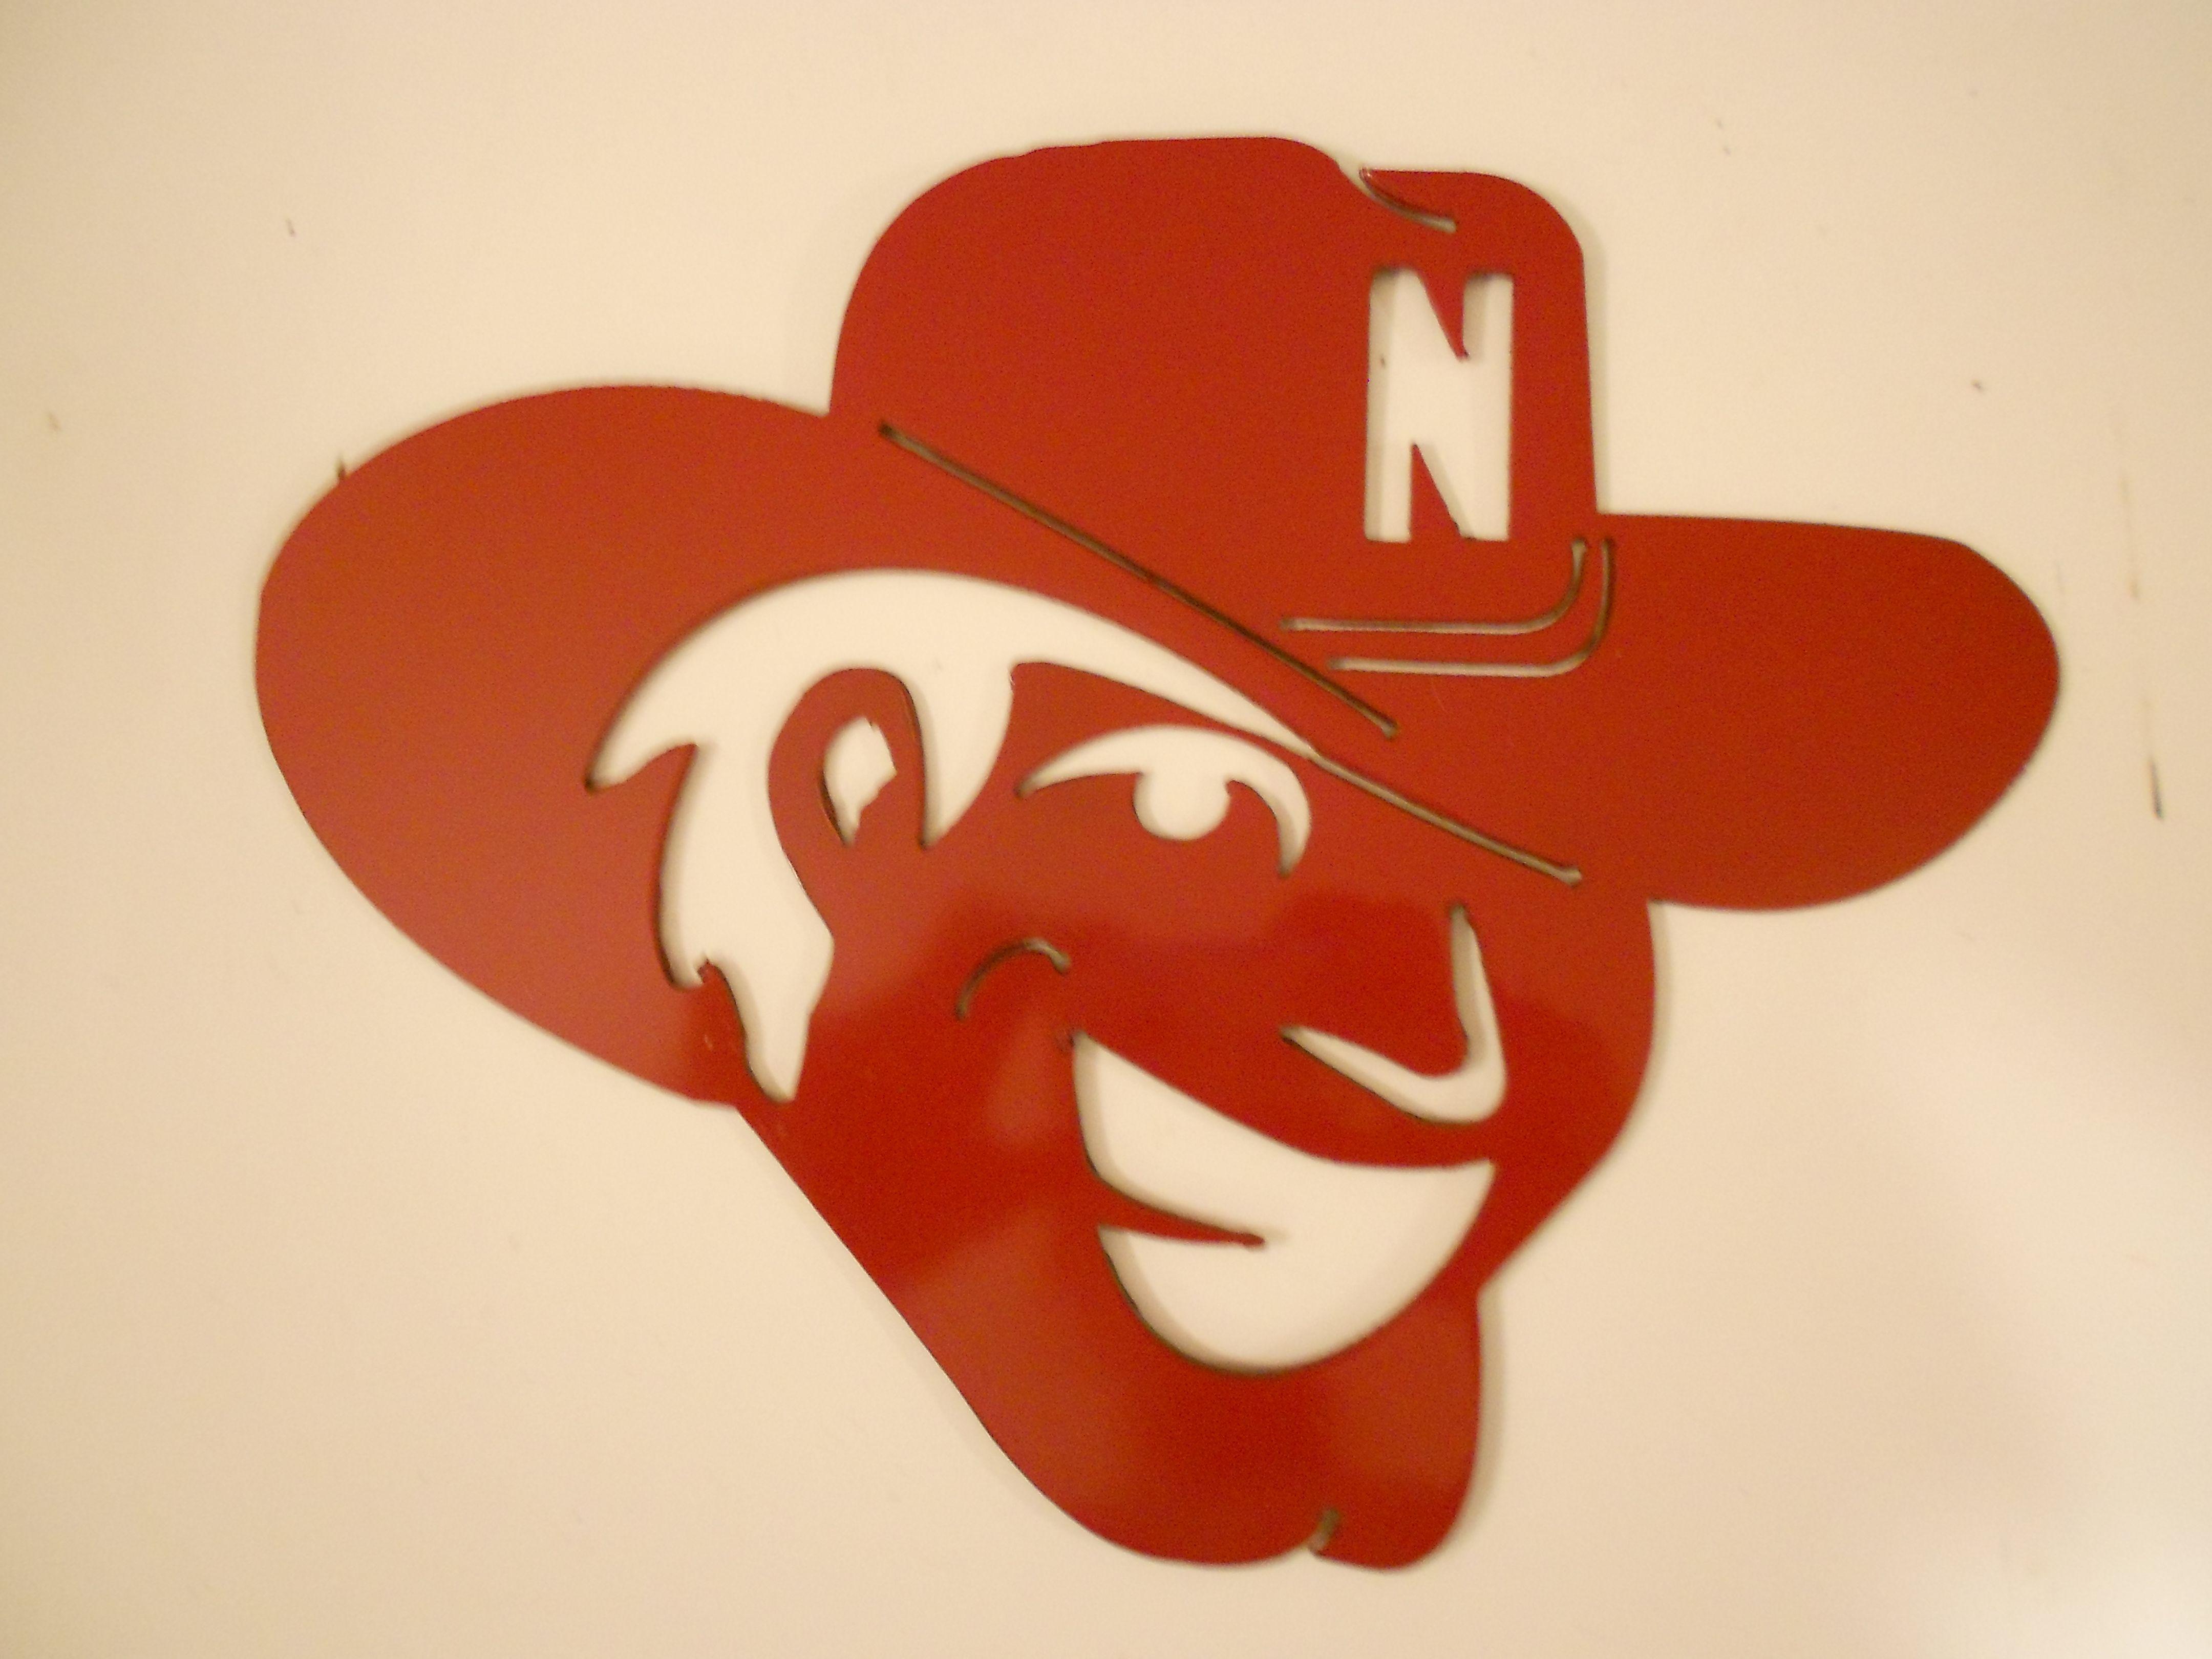 Nebraska Huskers Herbie Husker Metal Wall Art Crafts Metal Wall Art Husker